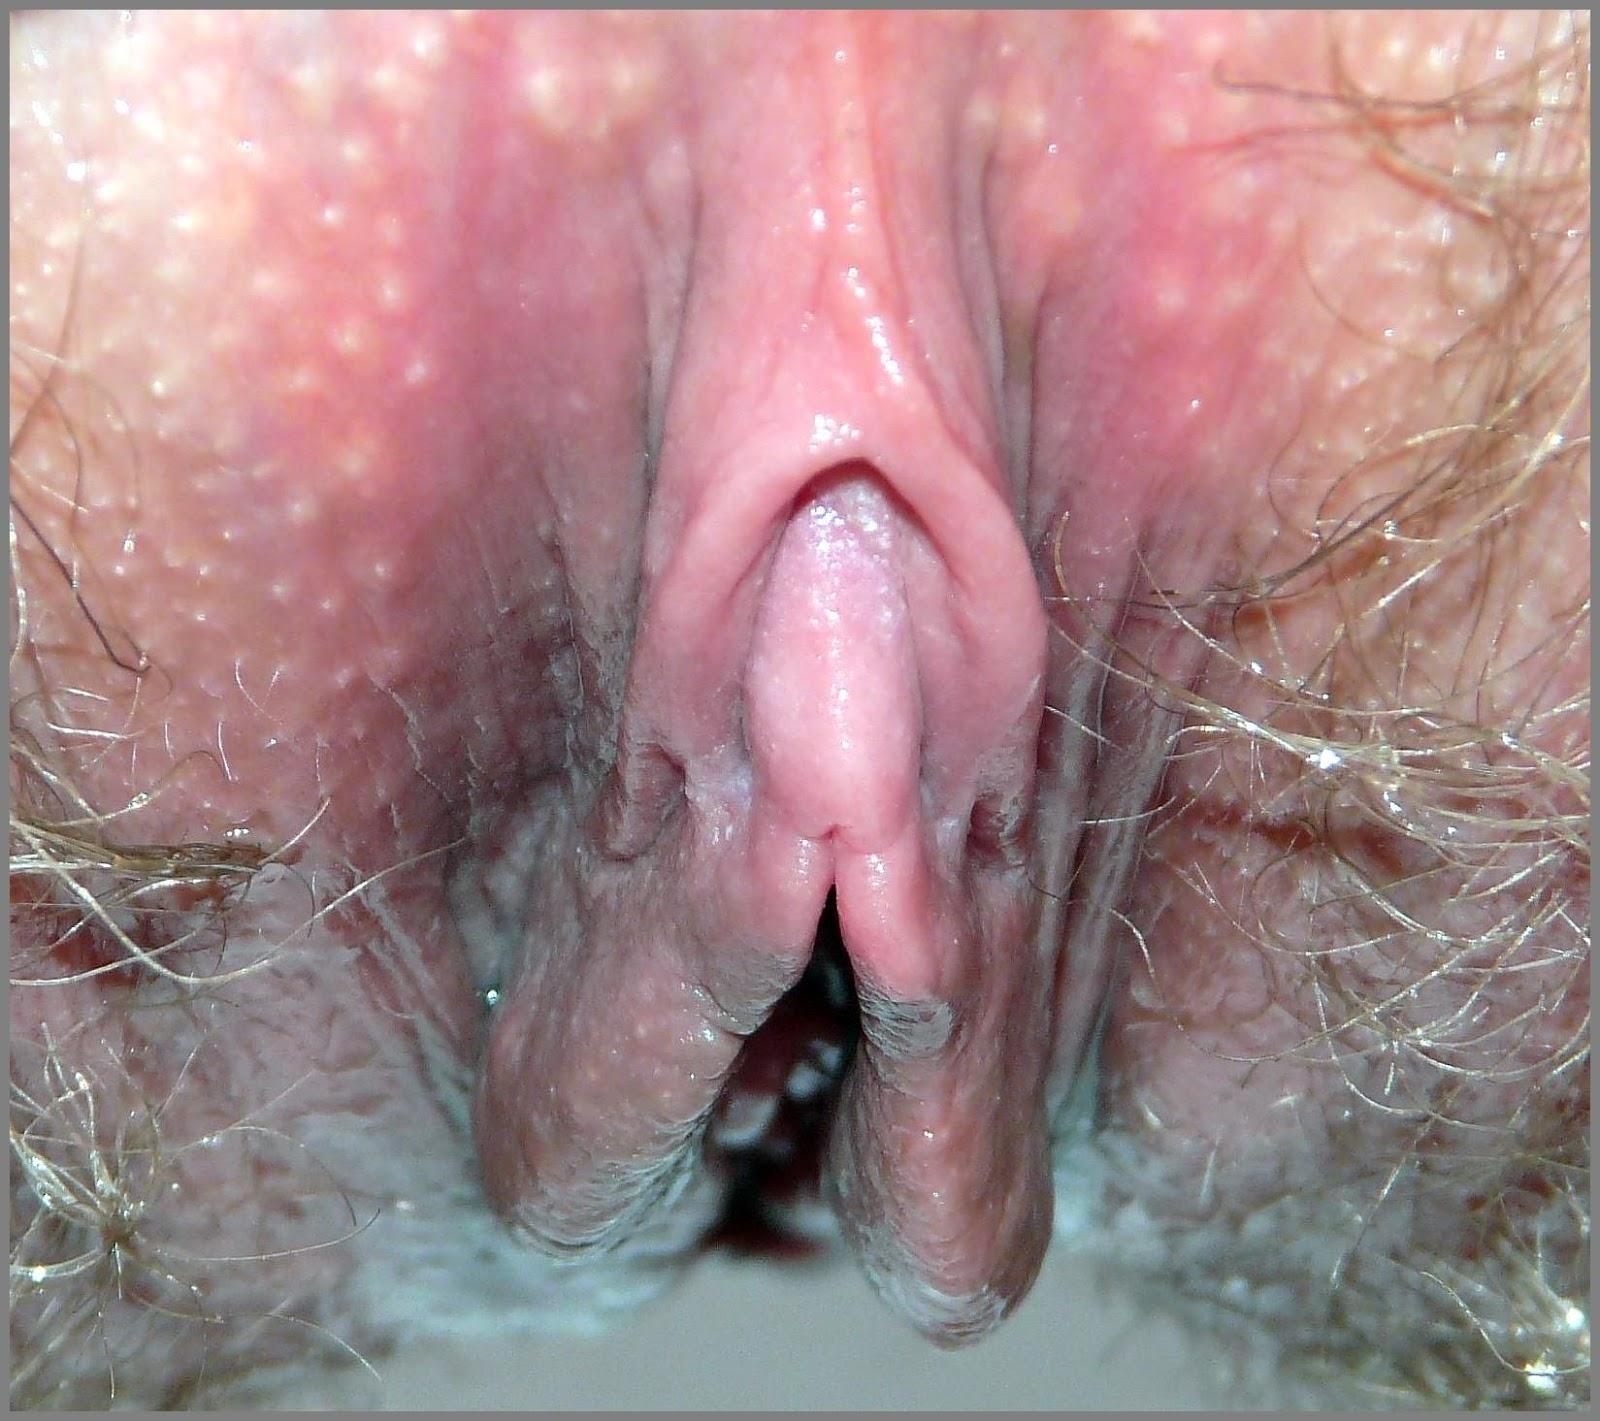 Clitoris photo gallery, woman big tits straddle man naked